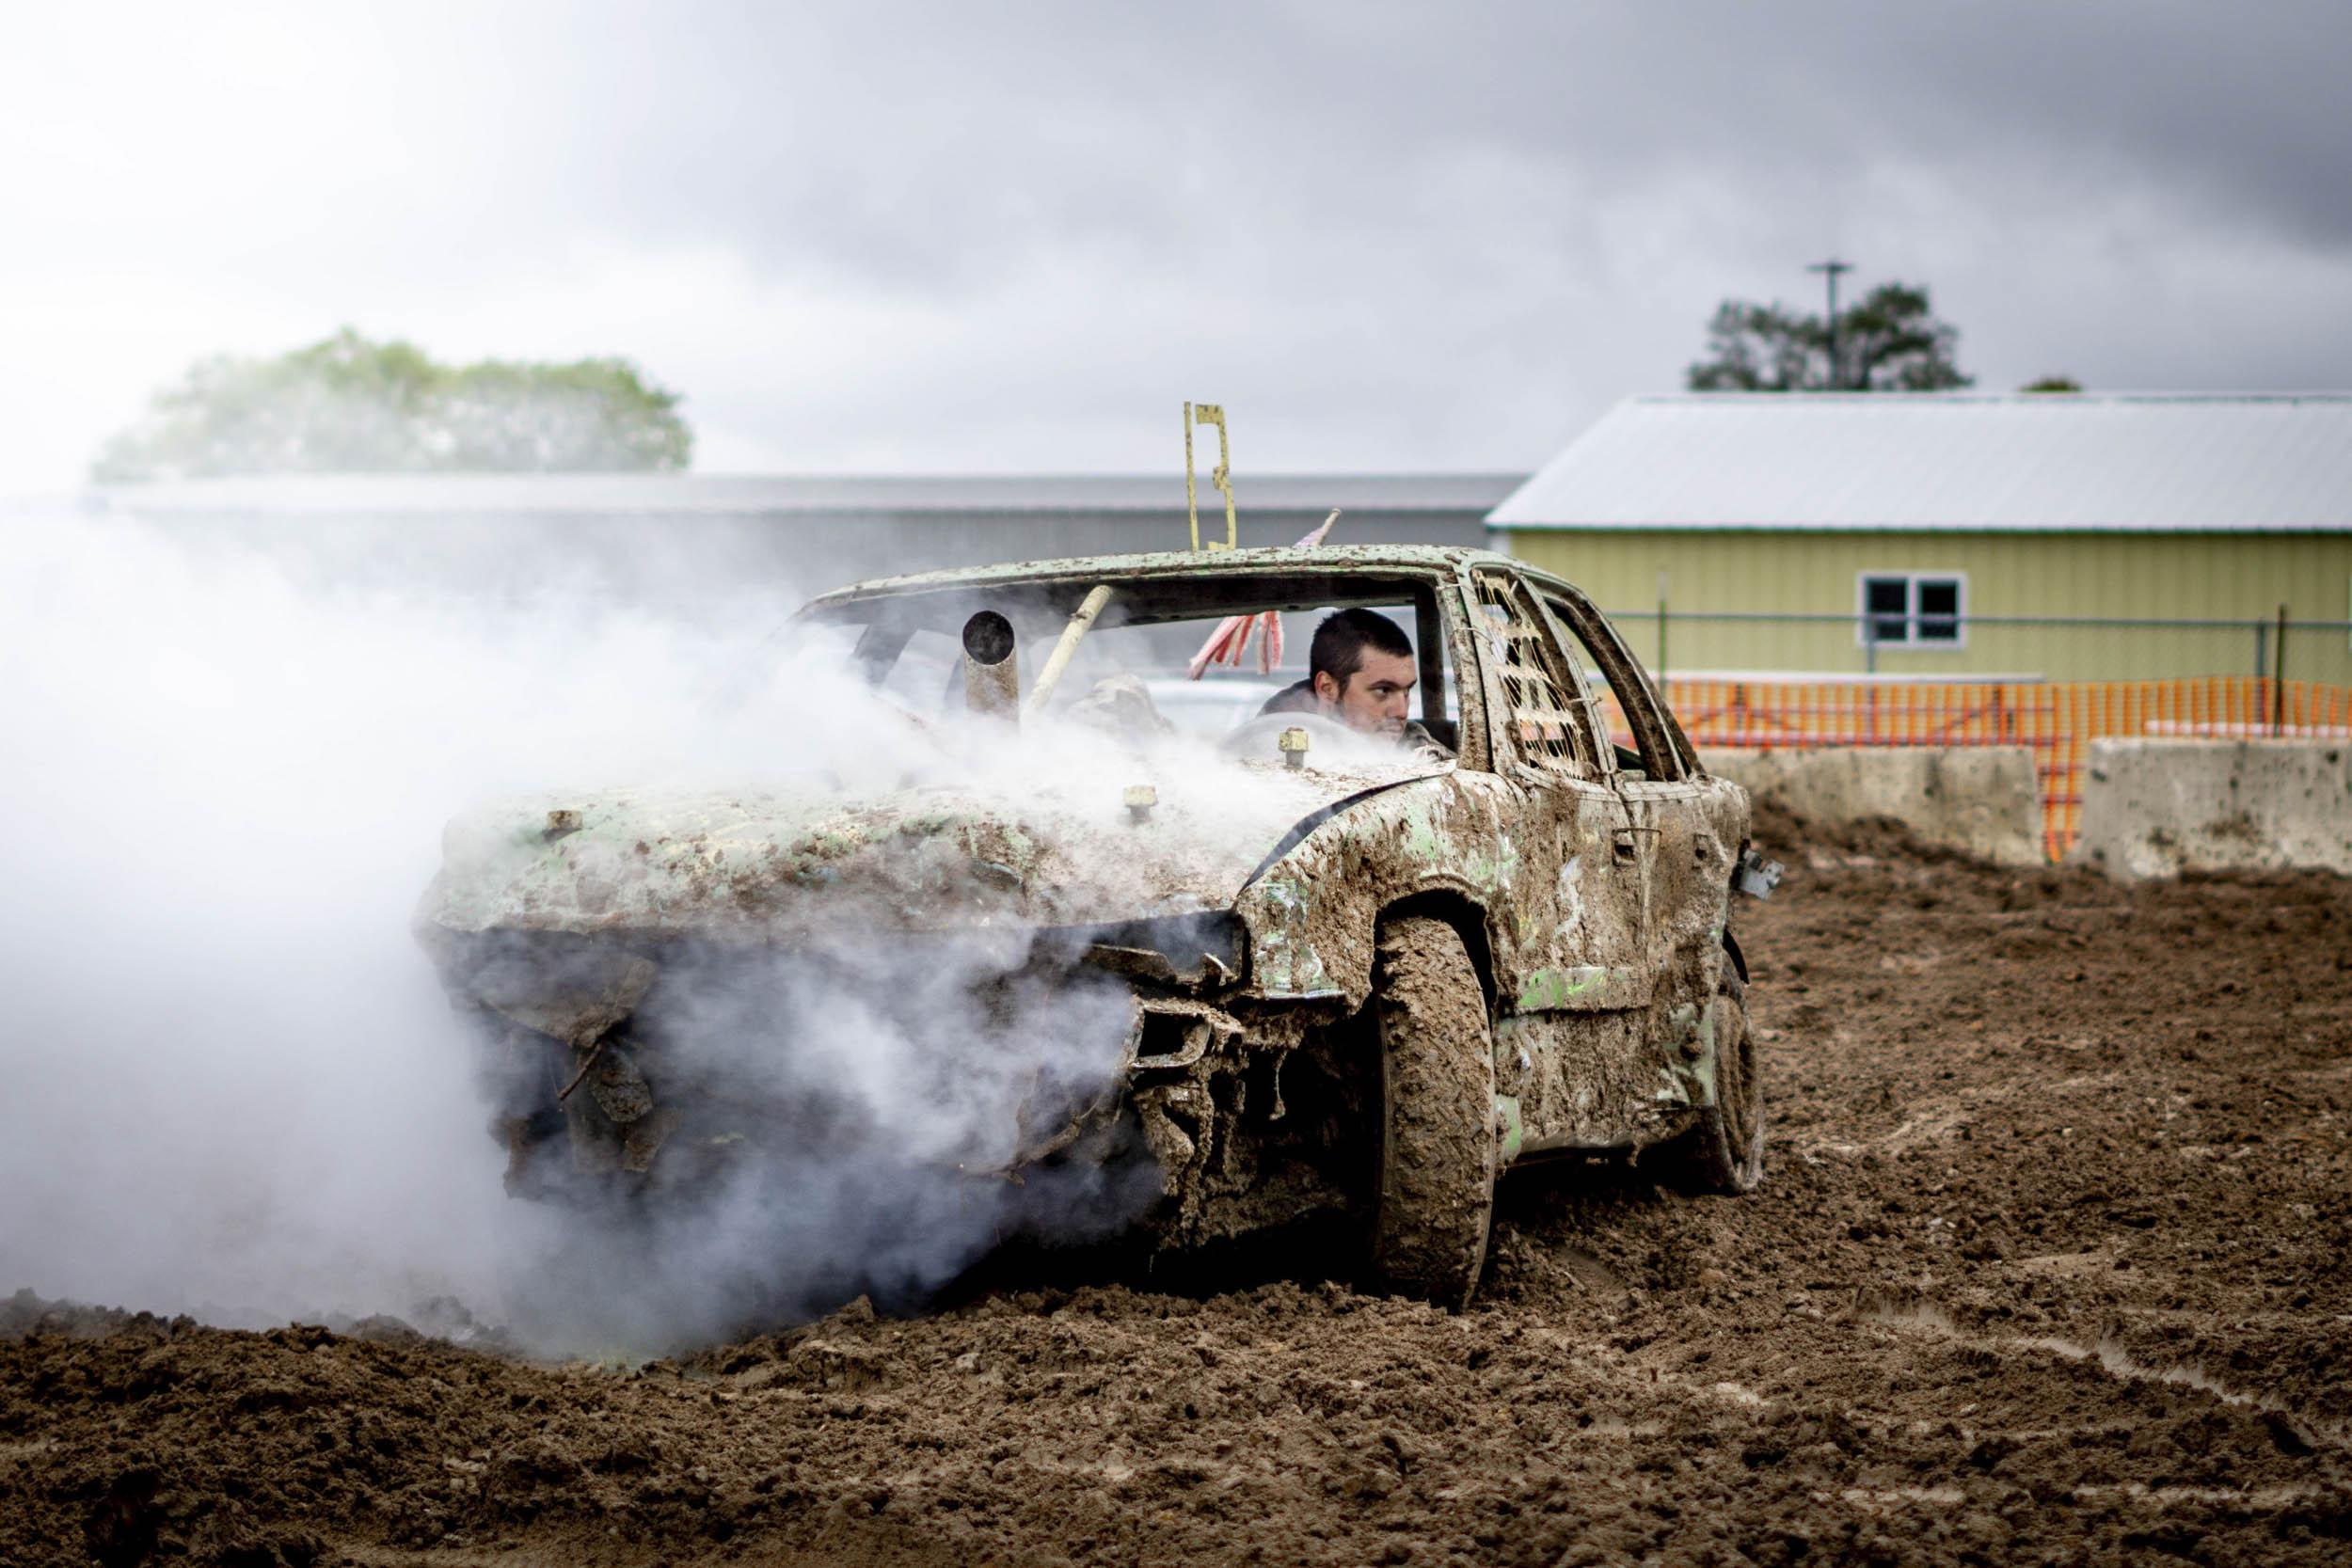 crashed demolition derby car smoking